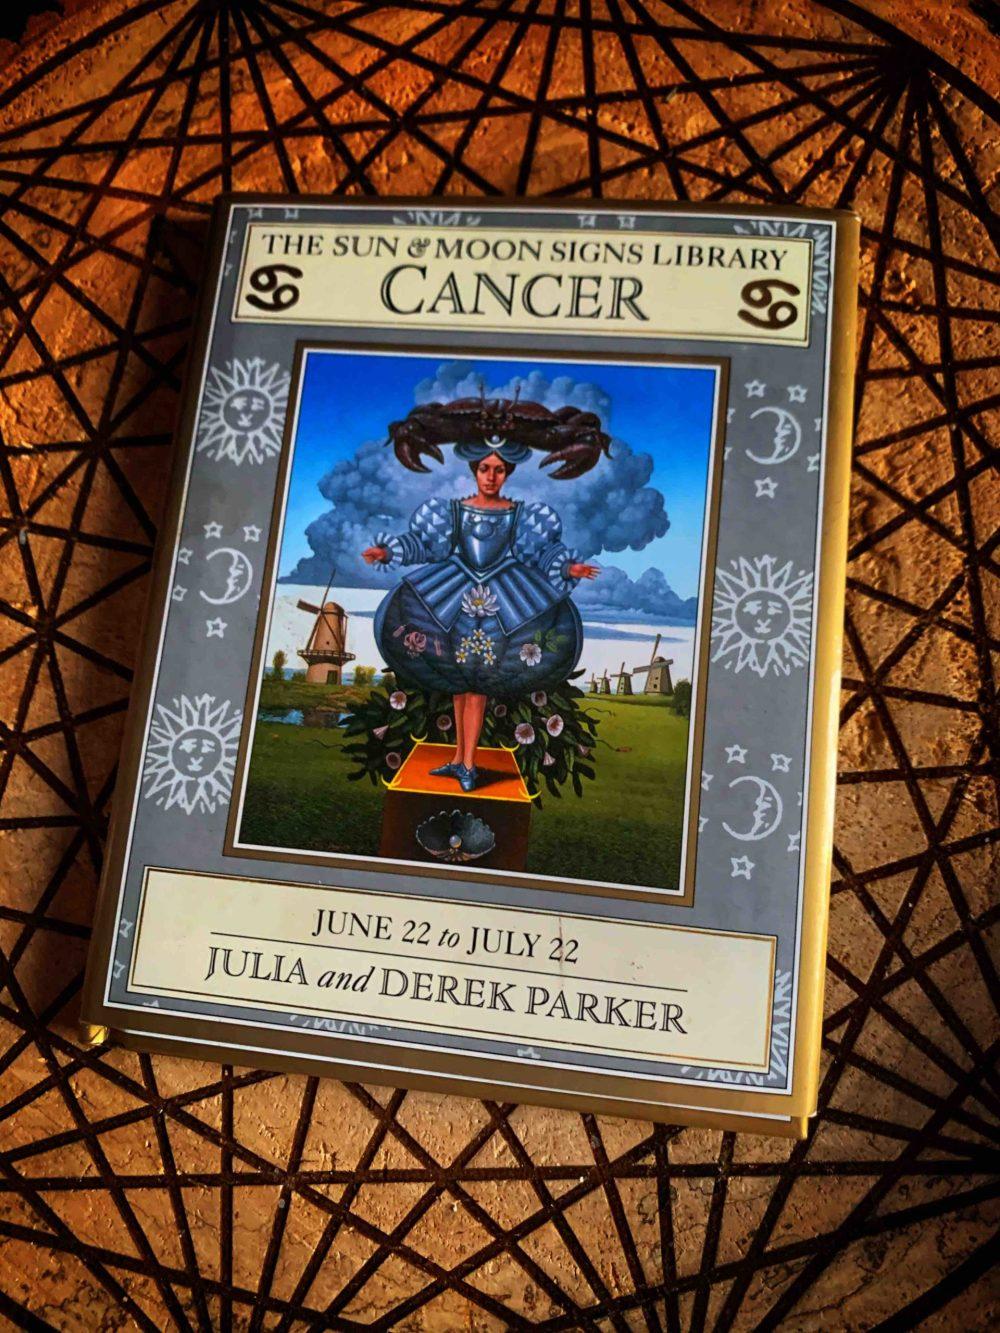 Sun & Moon Signs - Cancer